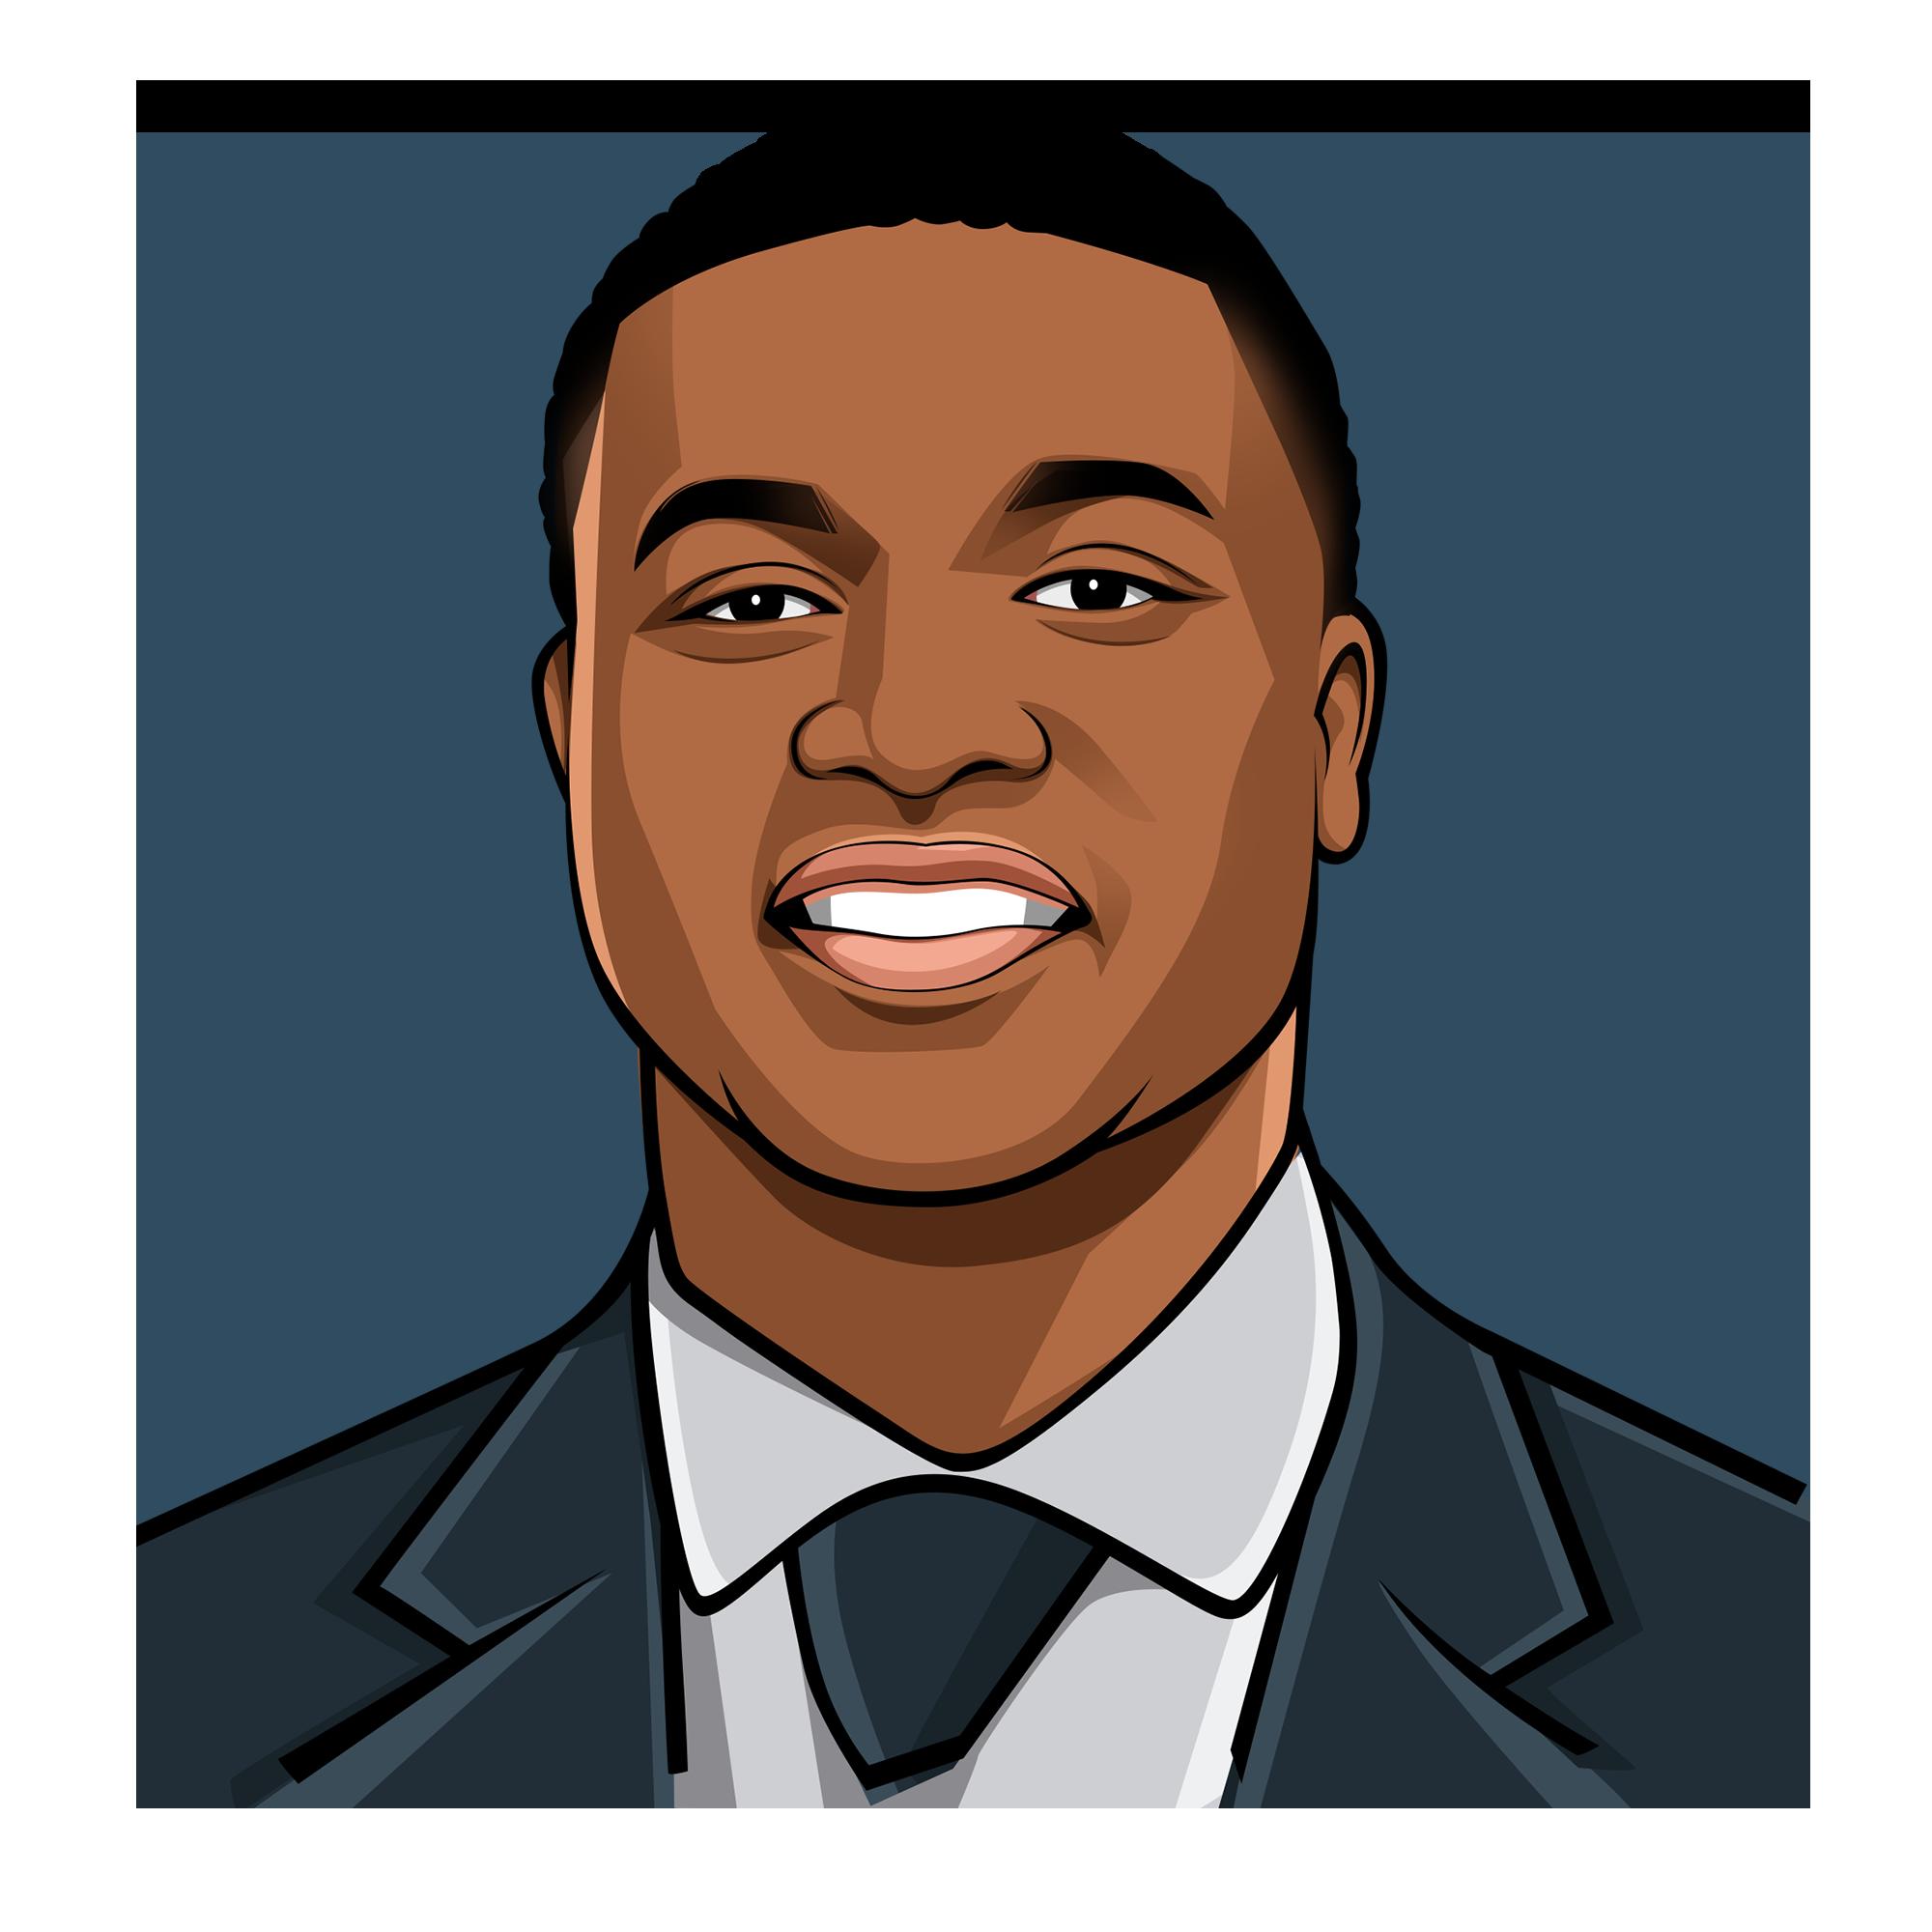 Daniel James, Co-Founder & CEO at PostureHealth